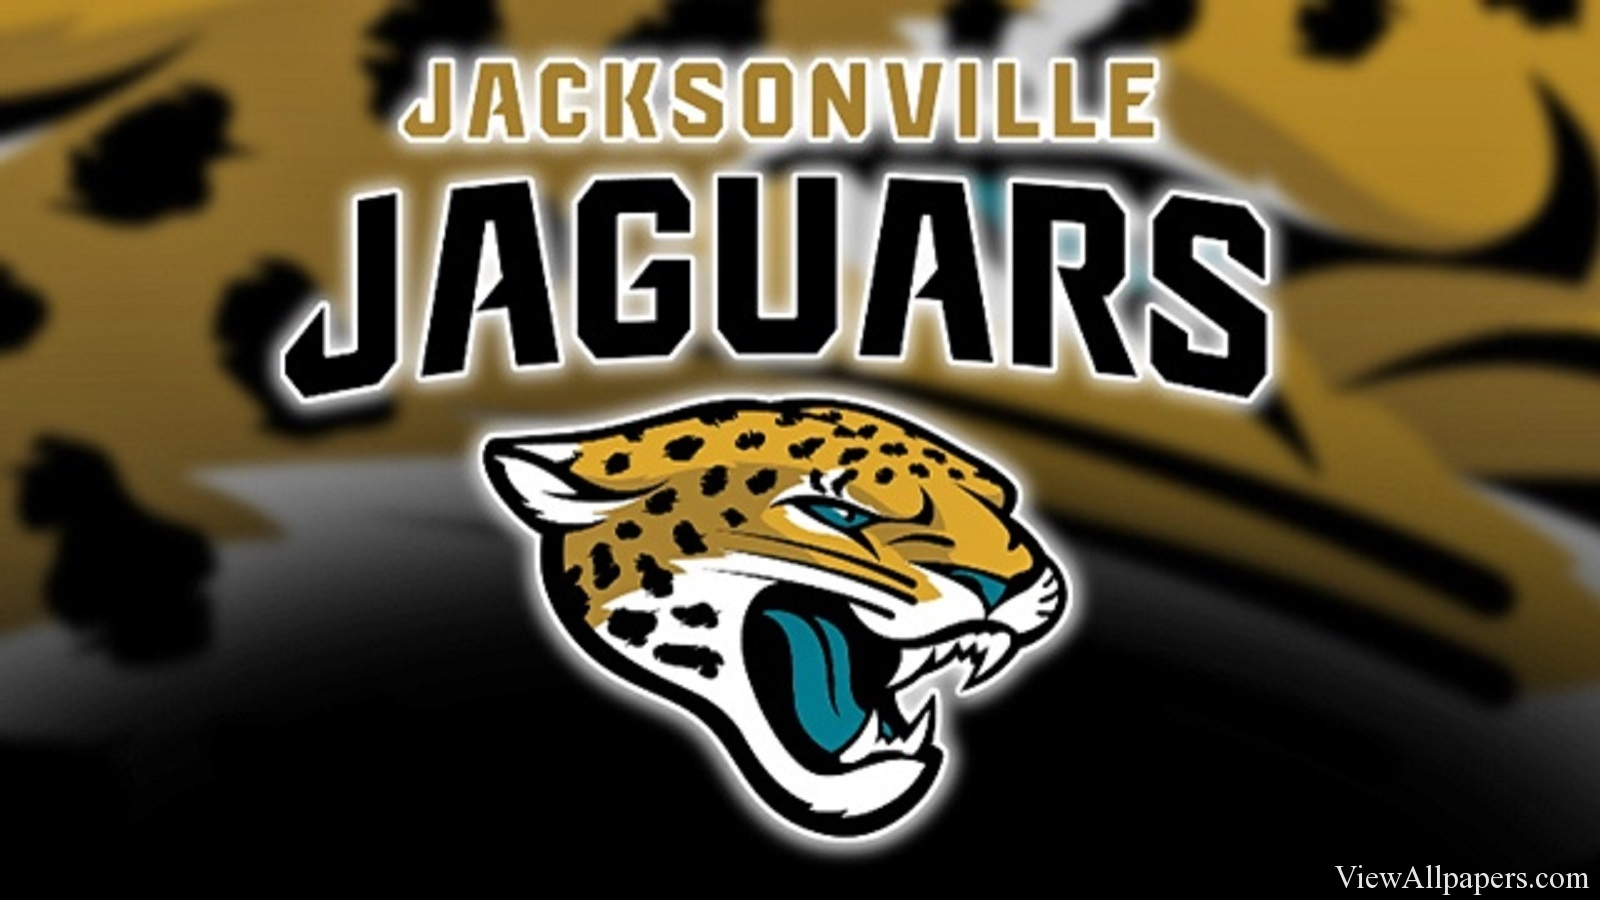 Jacksonville Jaguars Logo HD Resolution Wallpaper download 1600x900